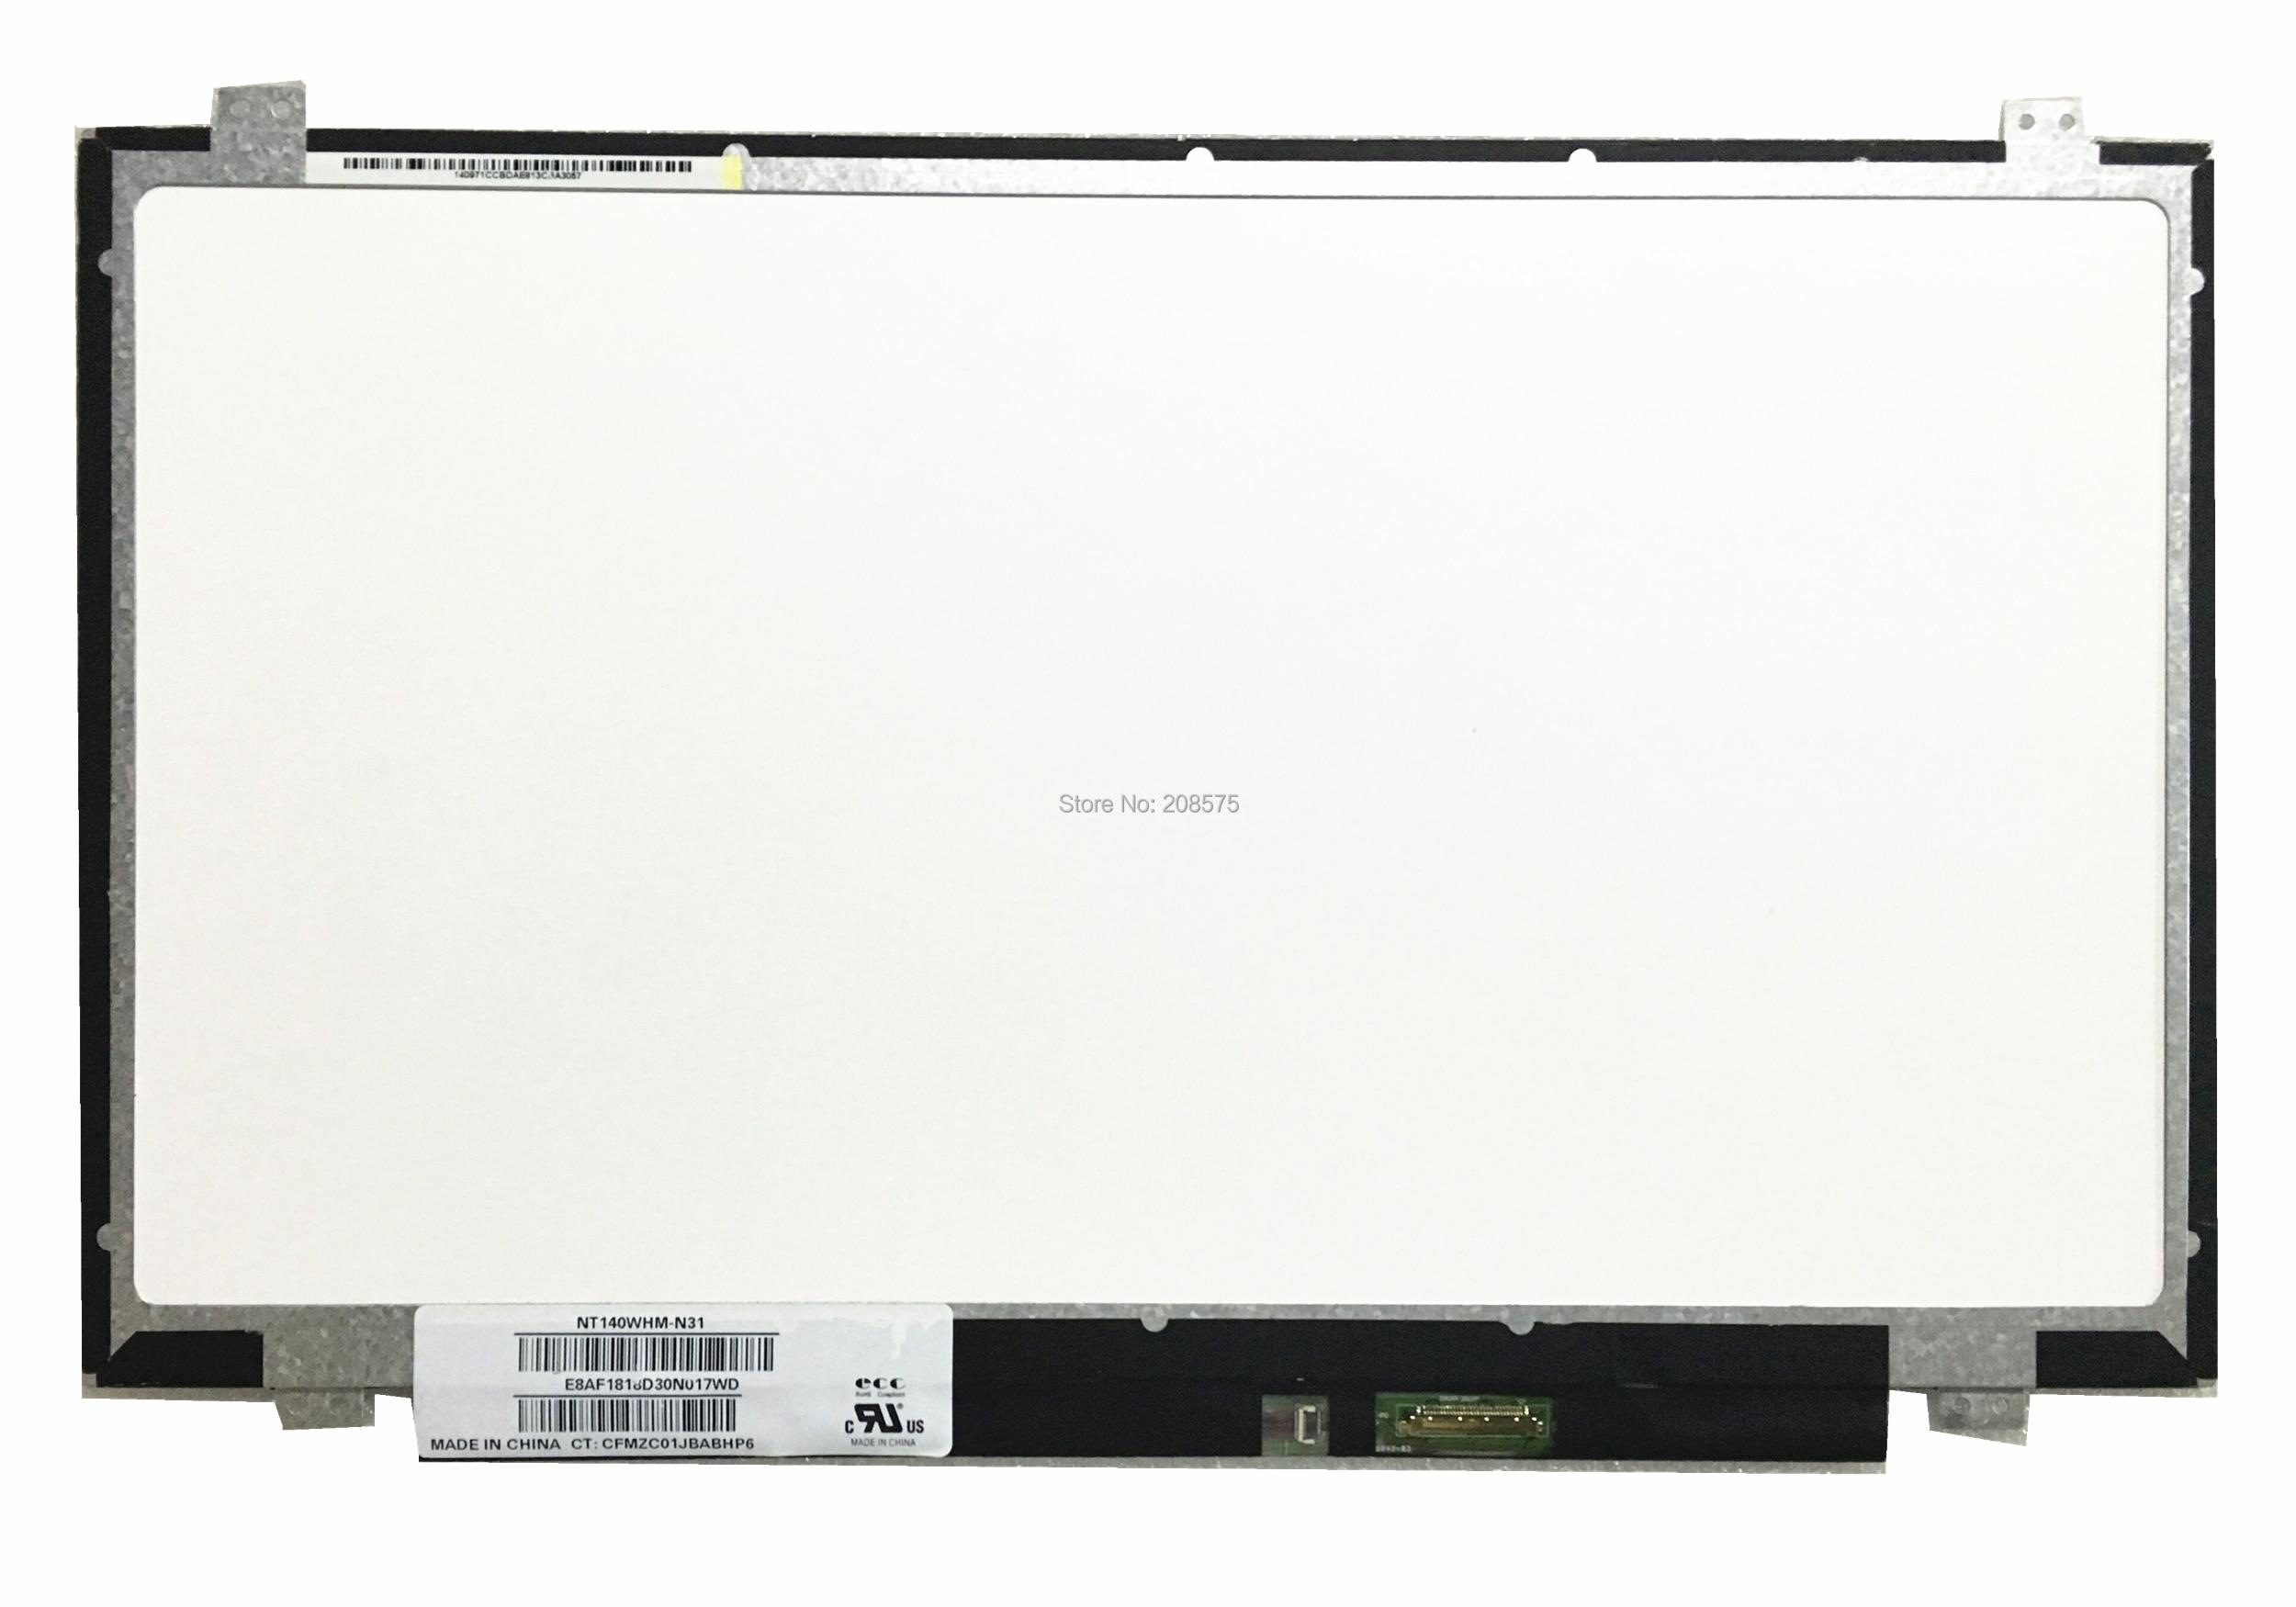 Lenovo E41 25 Driver Windows 10 64 Bit